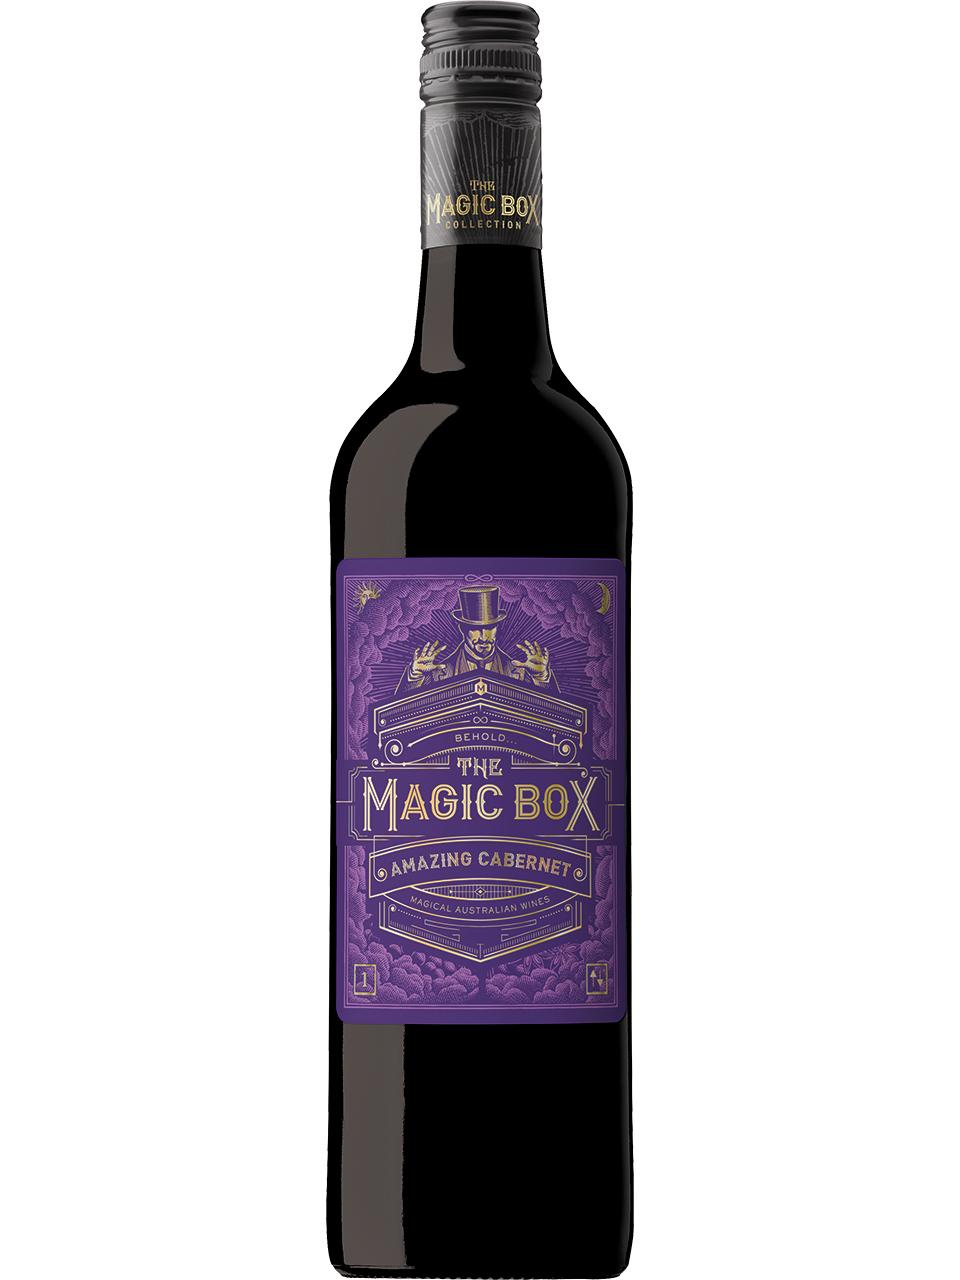 The Magic Box Amazing Cabernet